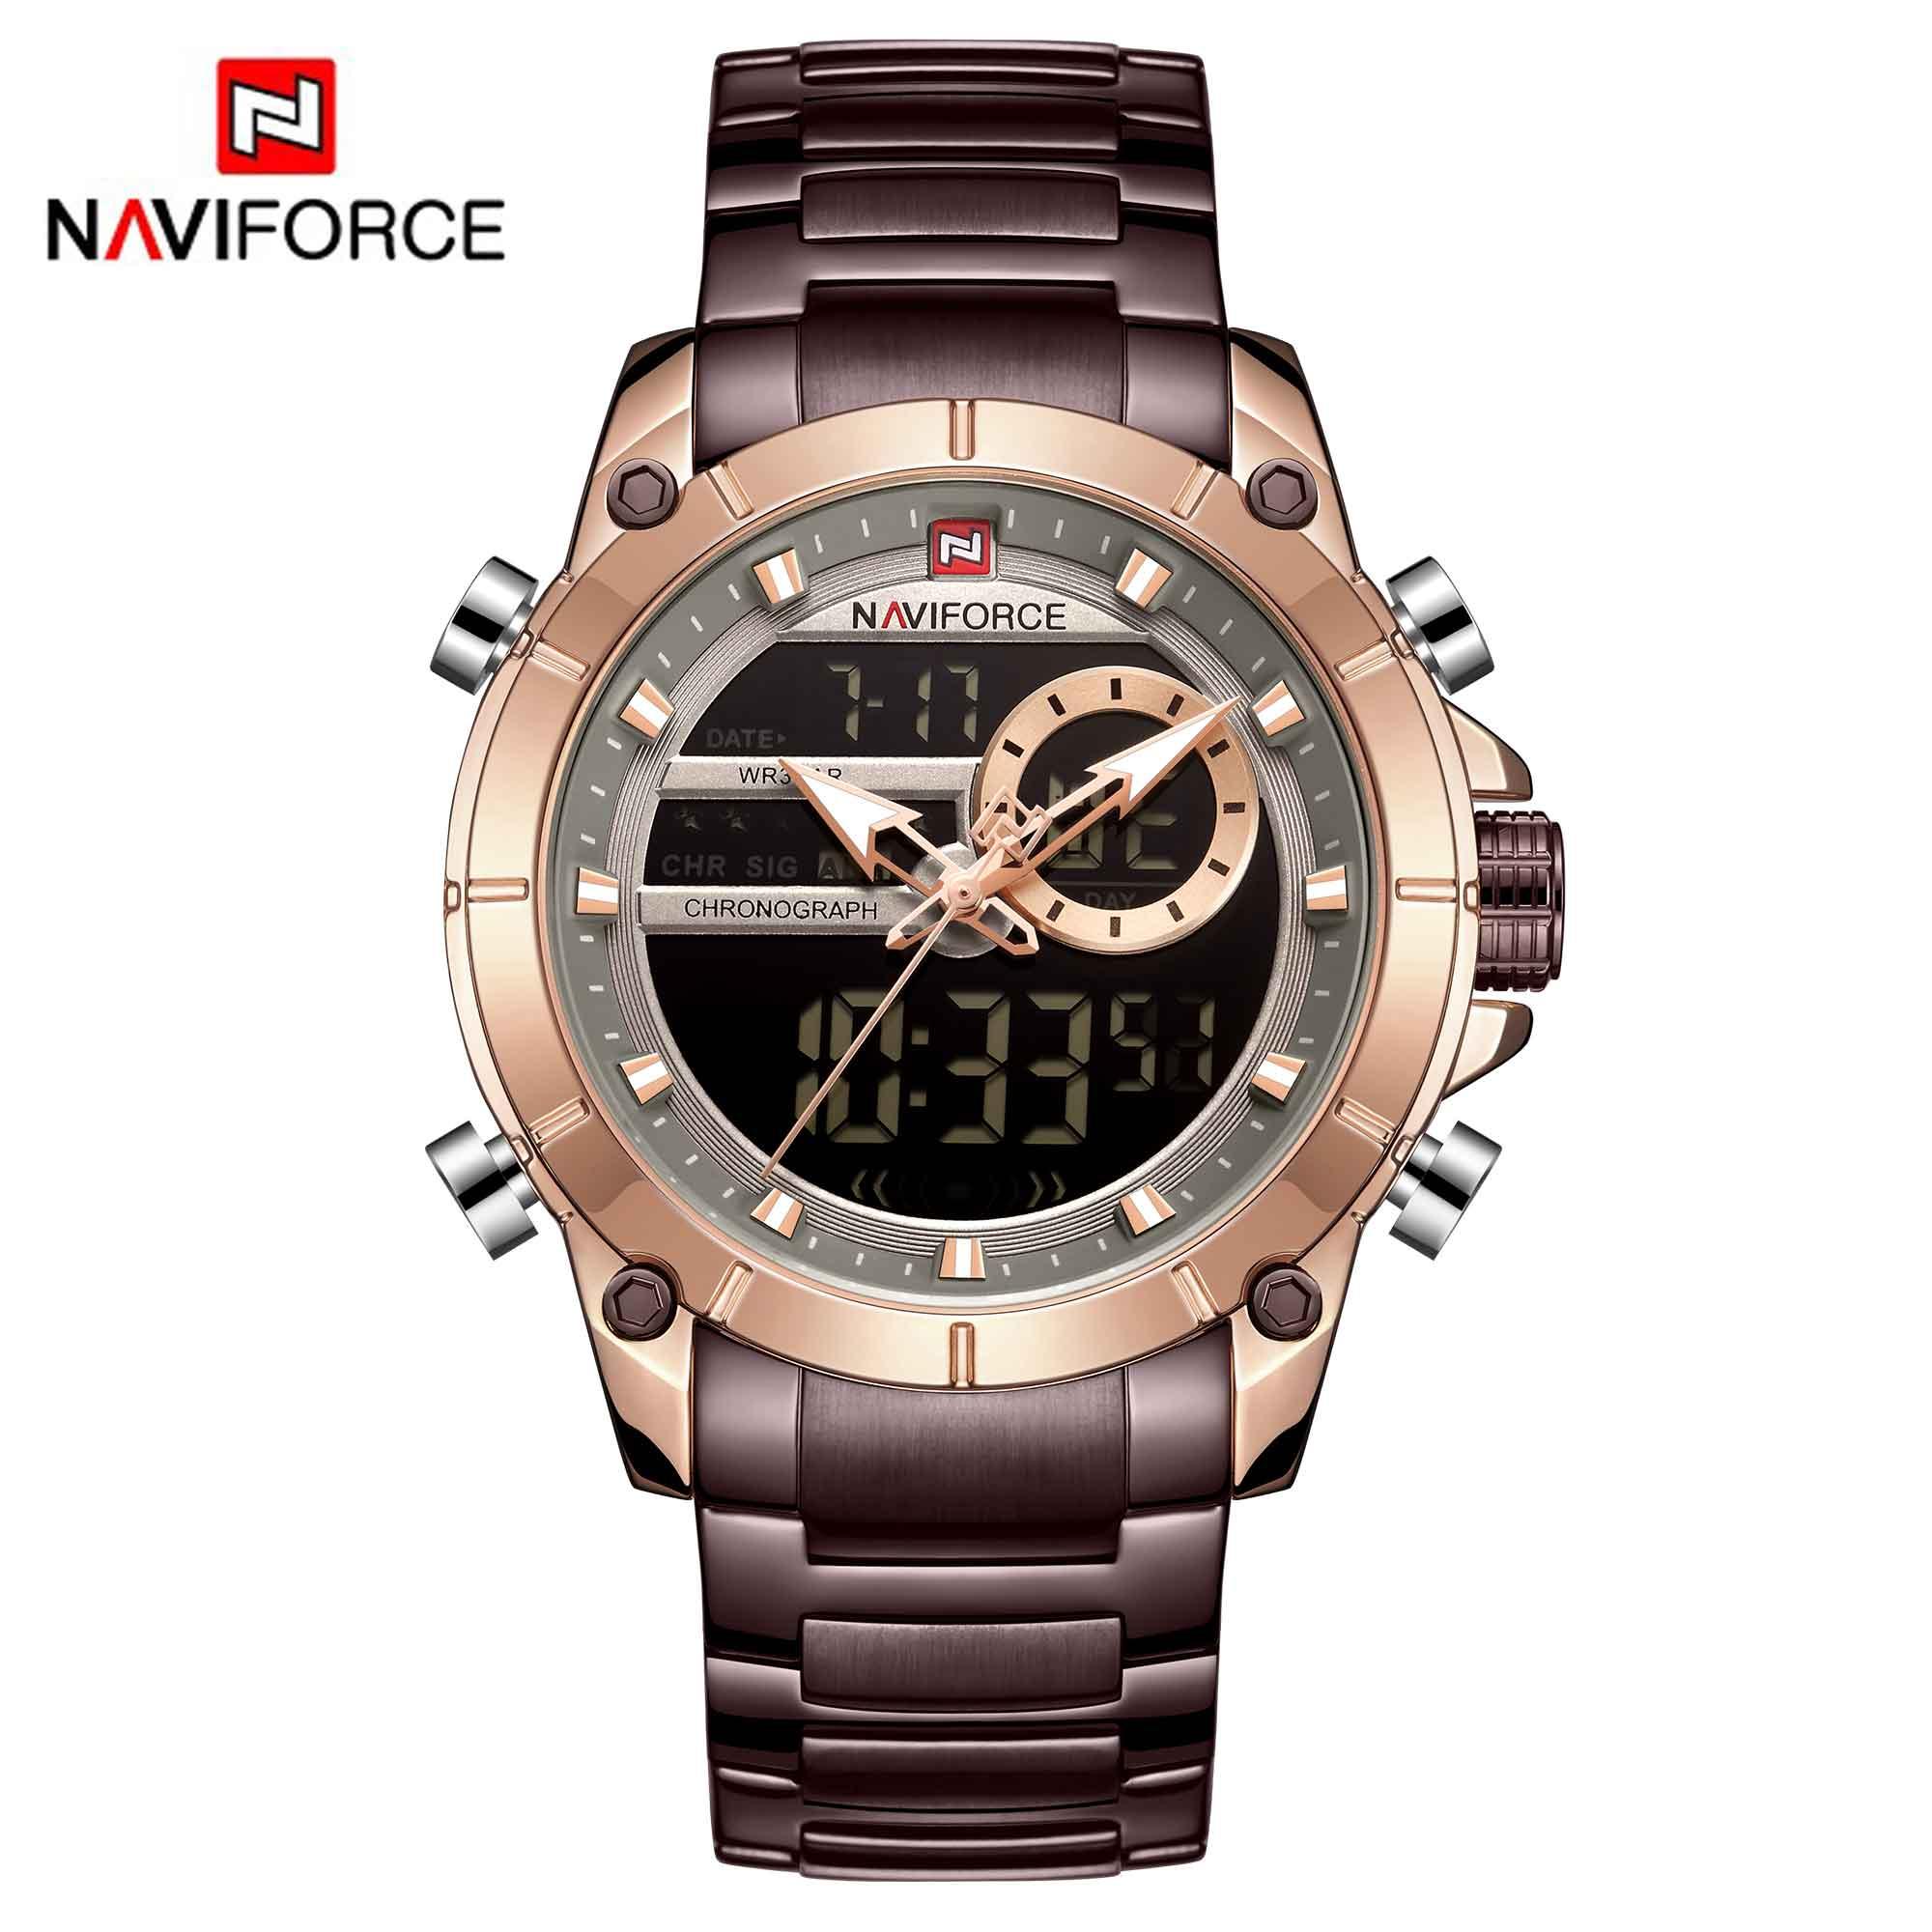 NAVIFORCE Hot Men Watches Fashion Casual Bussiness Quartz Watch Men Military Chronograph Stainless Steel Wristwatch Reloj Hombre 2